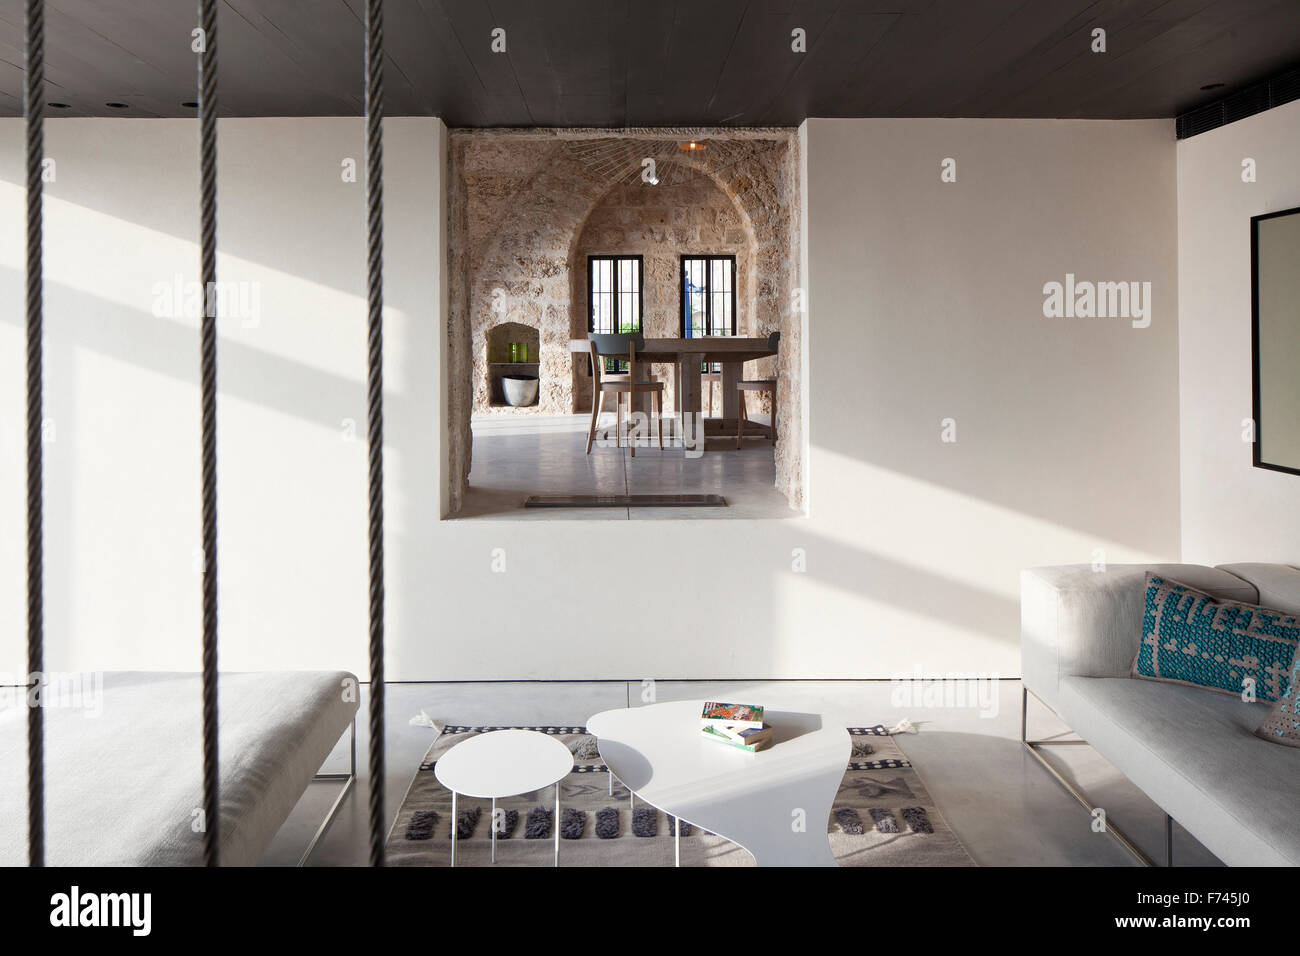 Split Level Wohnzimmer im Haus, Jaffa, Tel Aviv, Israel Stockfoto ...